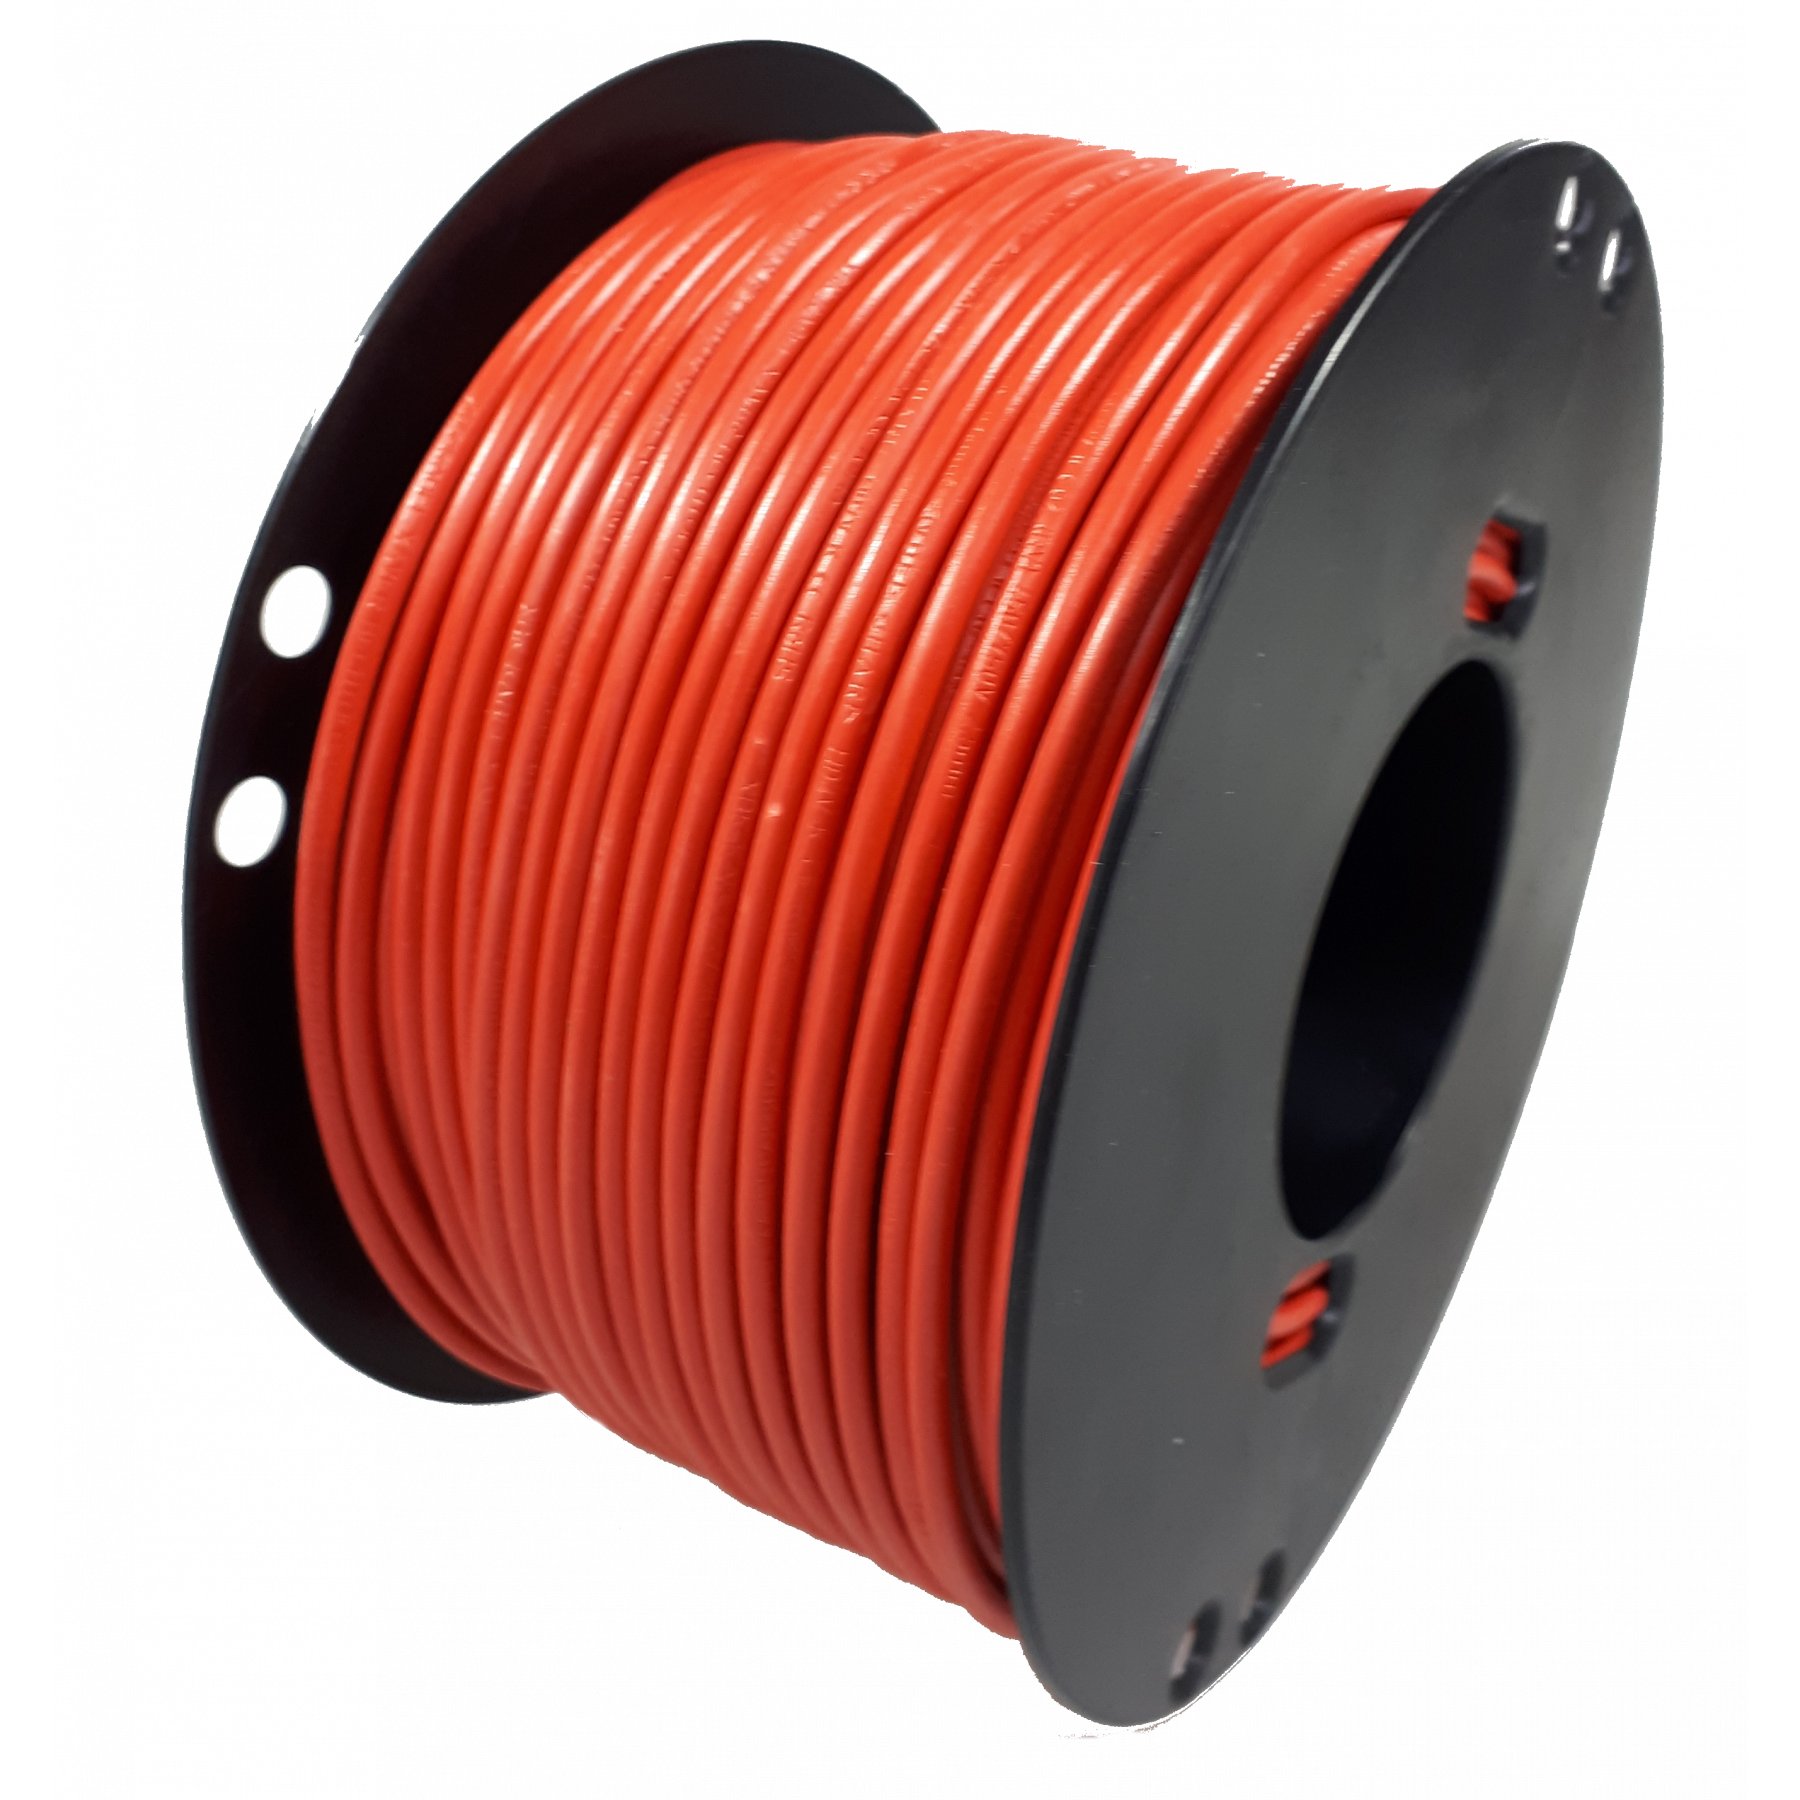 Kabel 2,5 rood 100m haspel